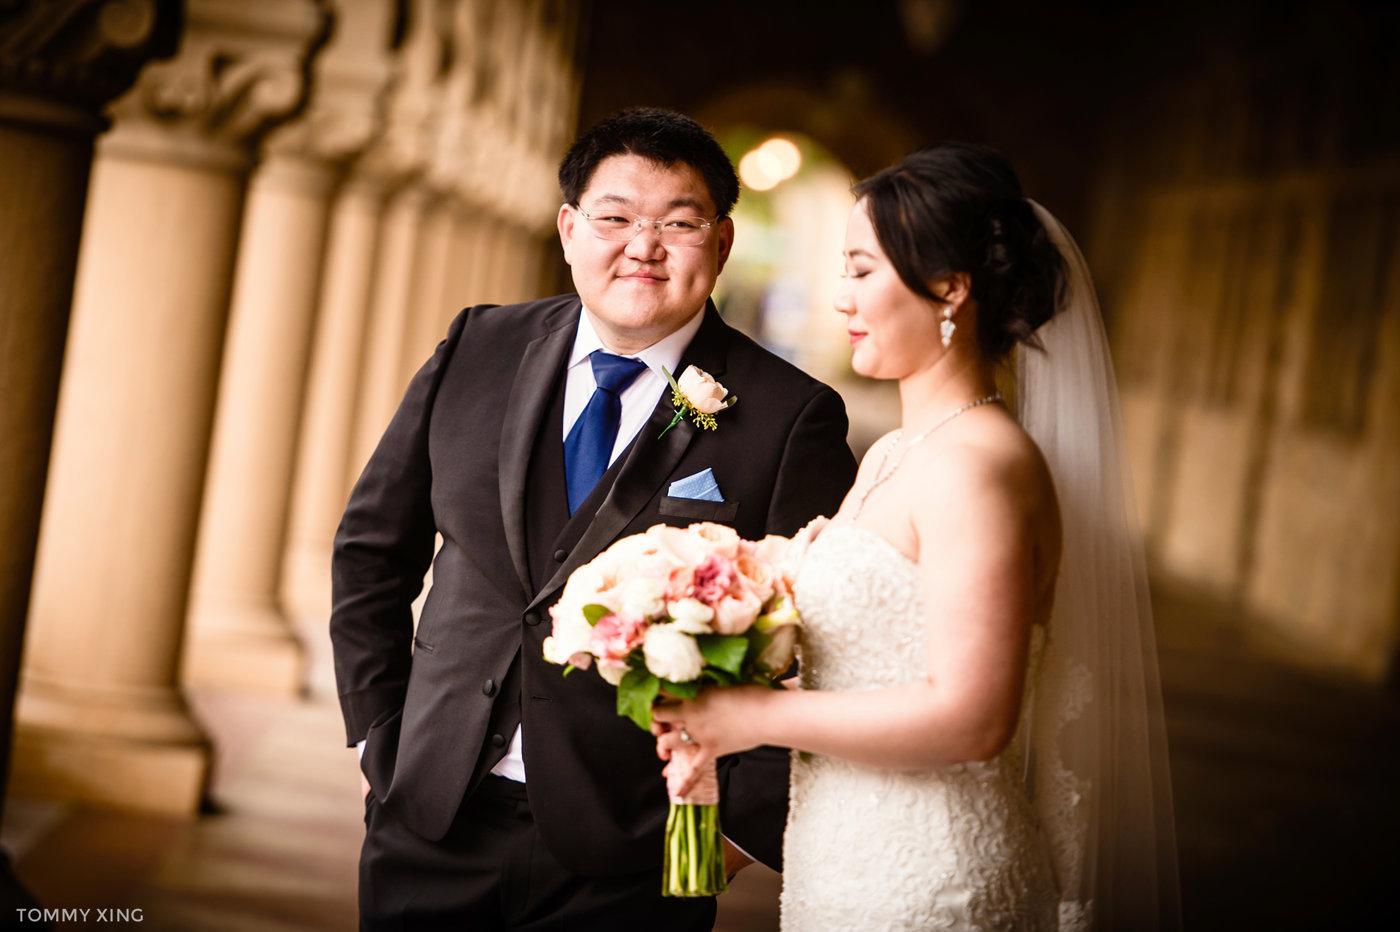 STANFORD MEMORIAL CHURCH WEDDING - Wenjie & Chengcheng - SAN FRANCISCO BAY AREA 斯坦福教堂婚礼跟拍 - 洛杉矶婚礼婚纱照摄影师 Tommy Xing Photography156.jpg